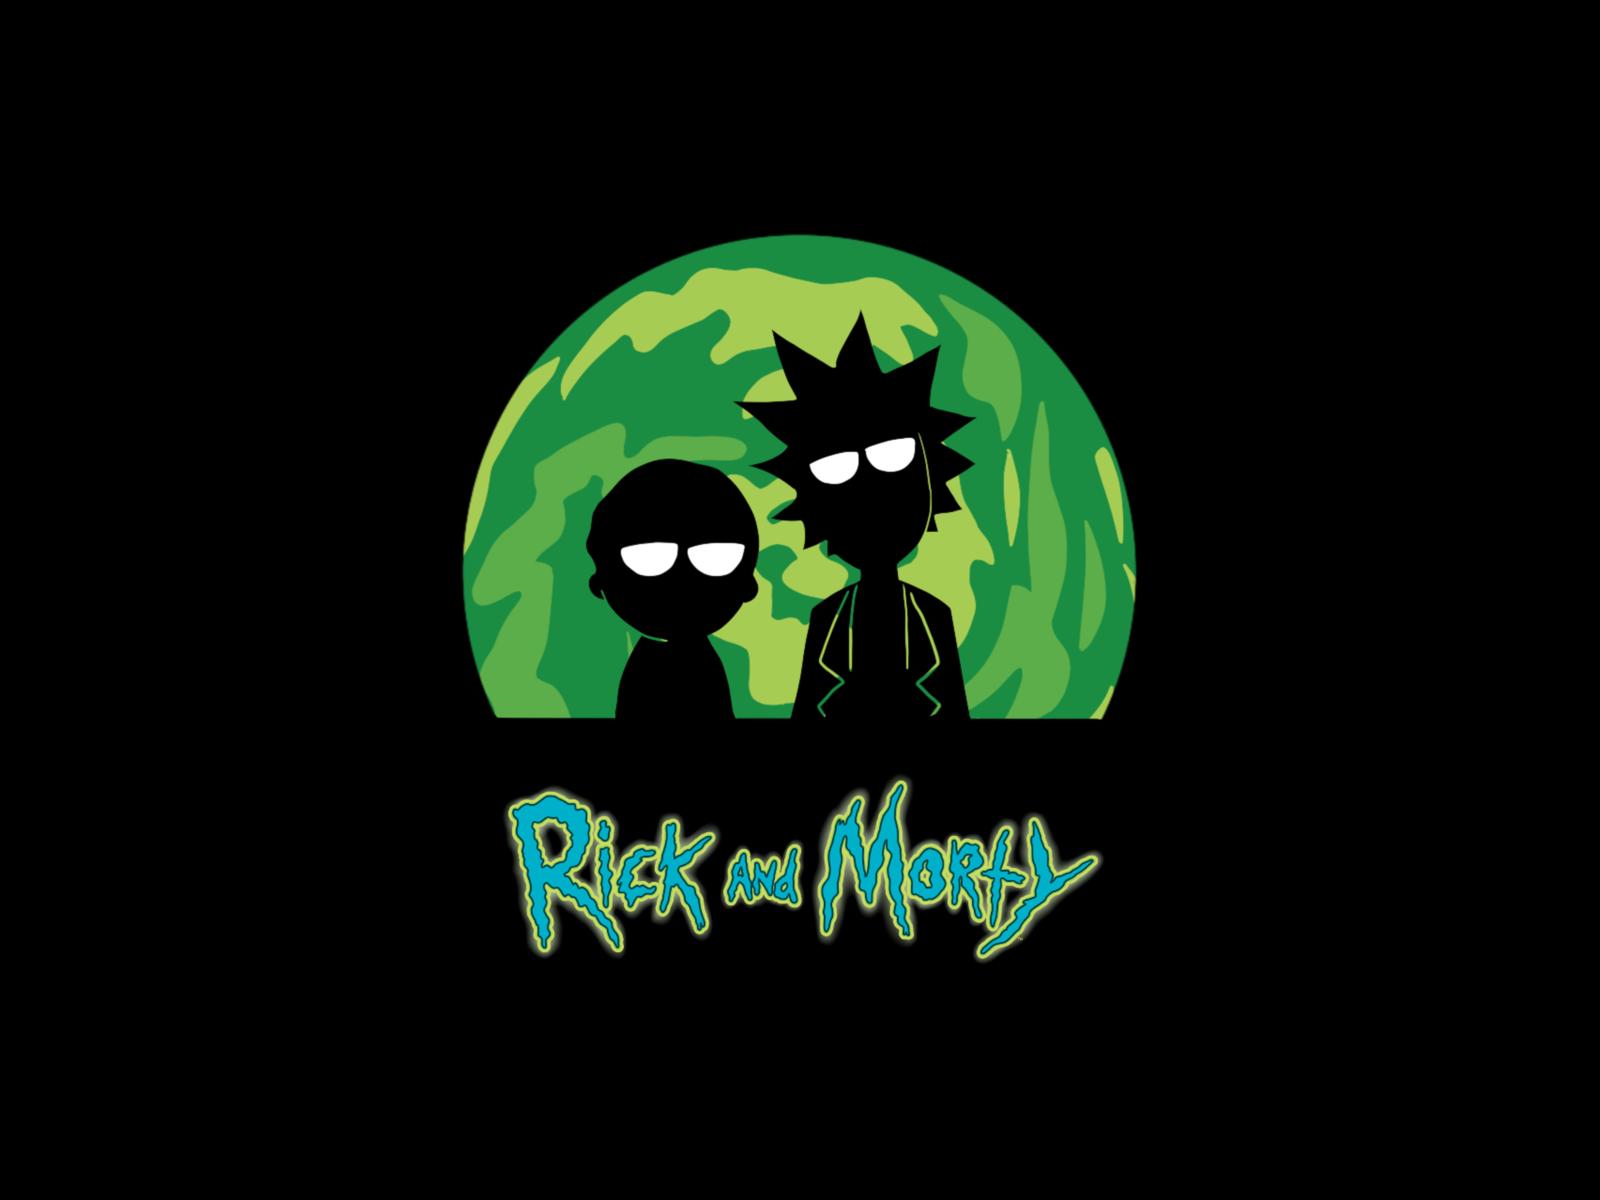 Rick And Morty In 2020 Rick And Morty Rick Morty